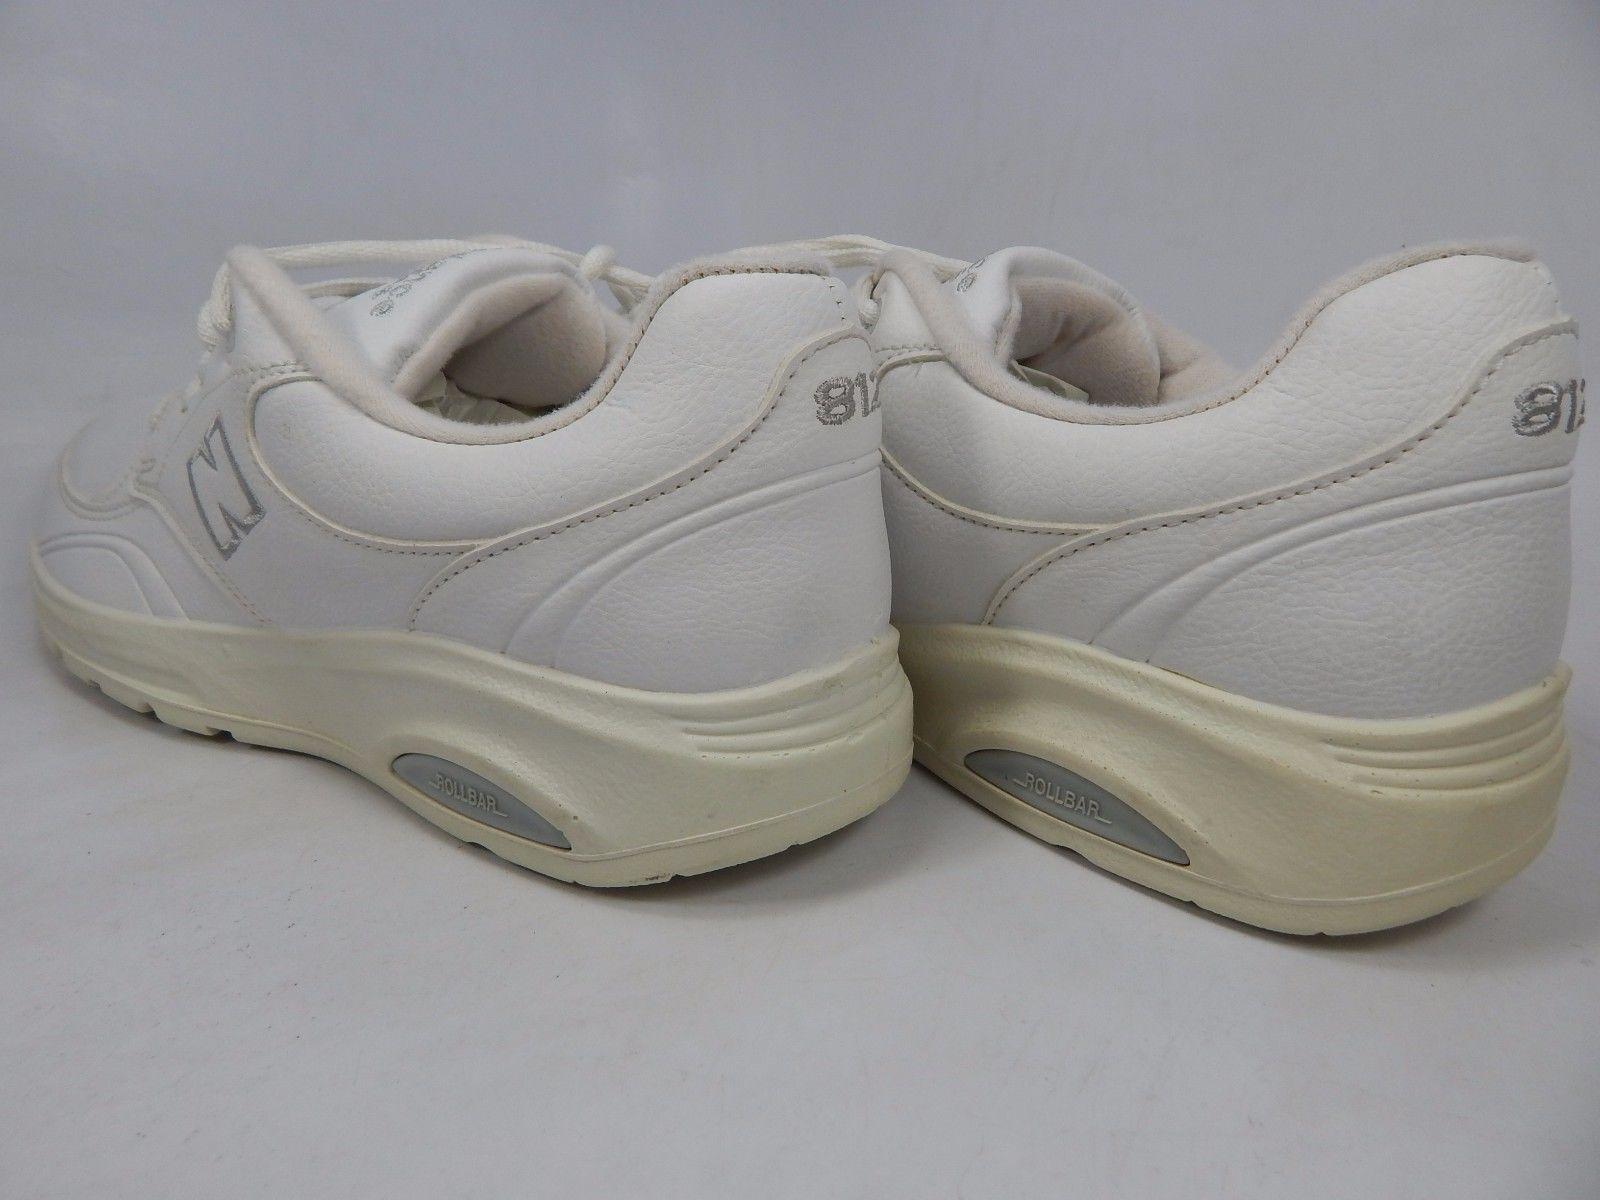 New Balance 812 Men's Walking Shoes Size US 8 M (D) EU 41.5 White MW812WT